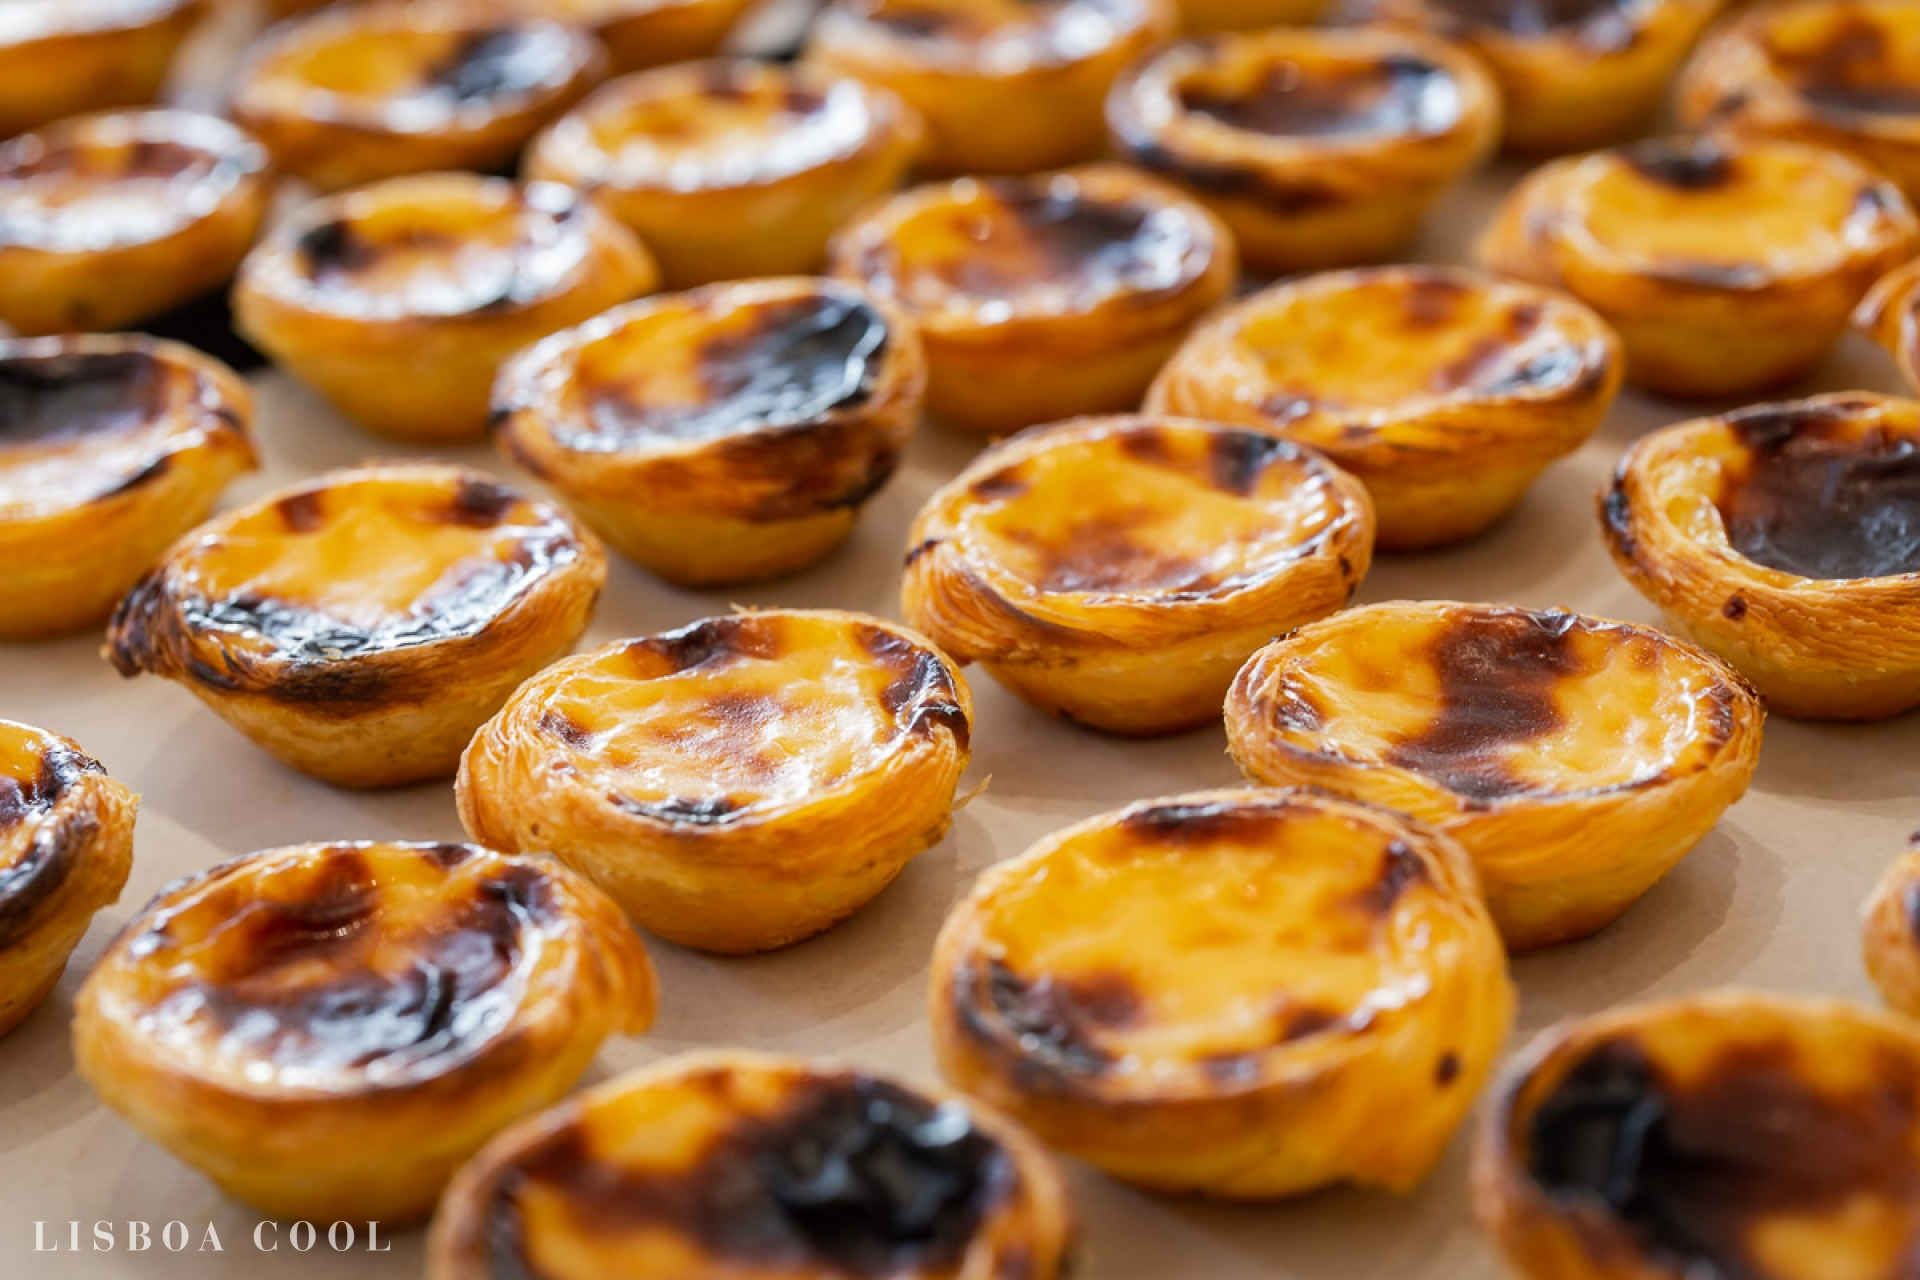 LisboaCool_Eat_Fábrica_da_Nata